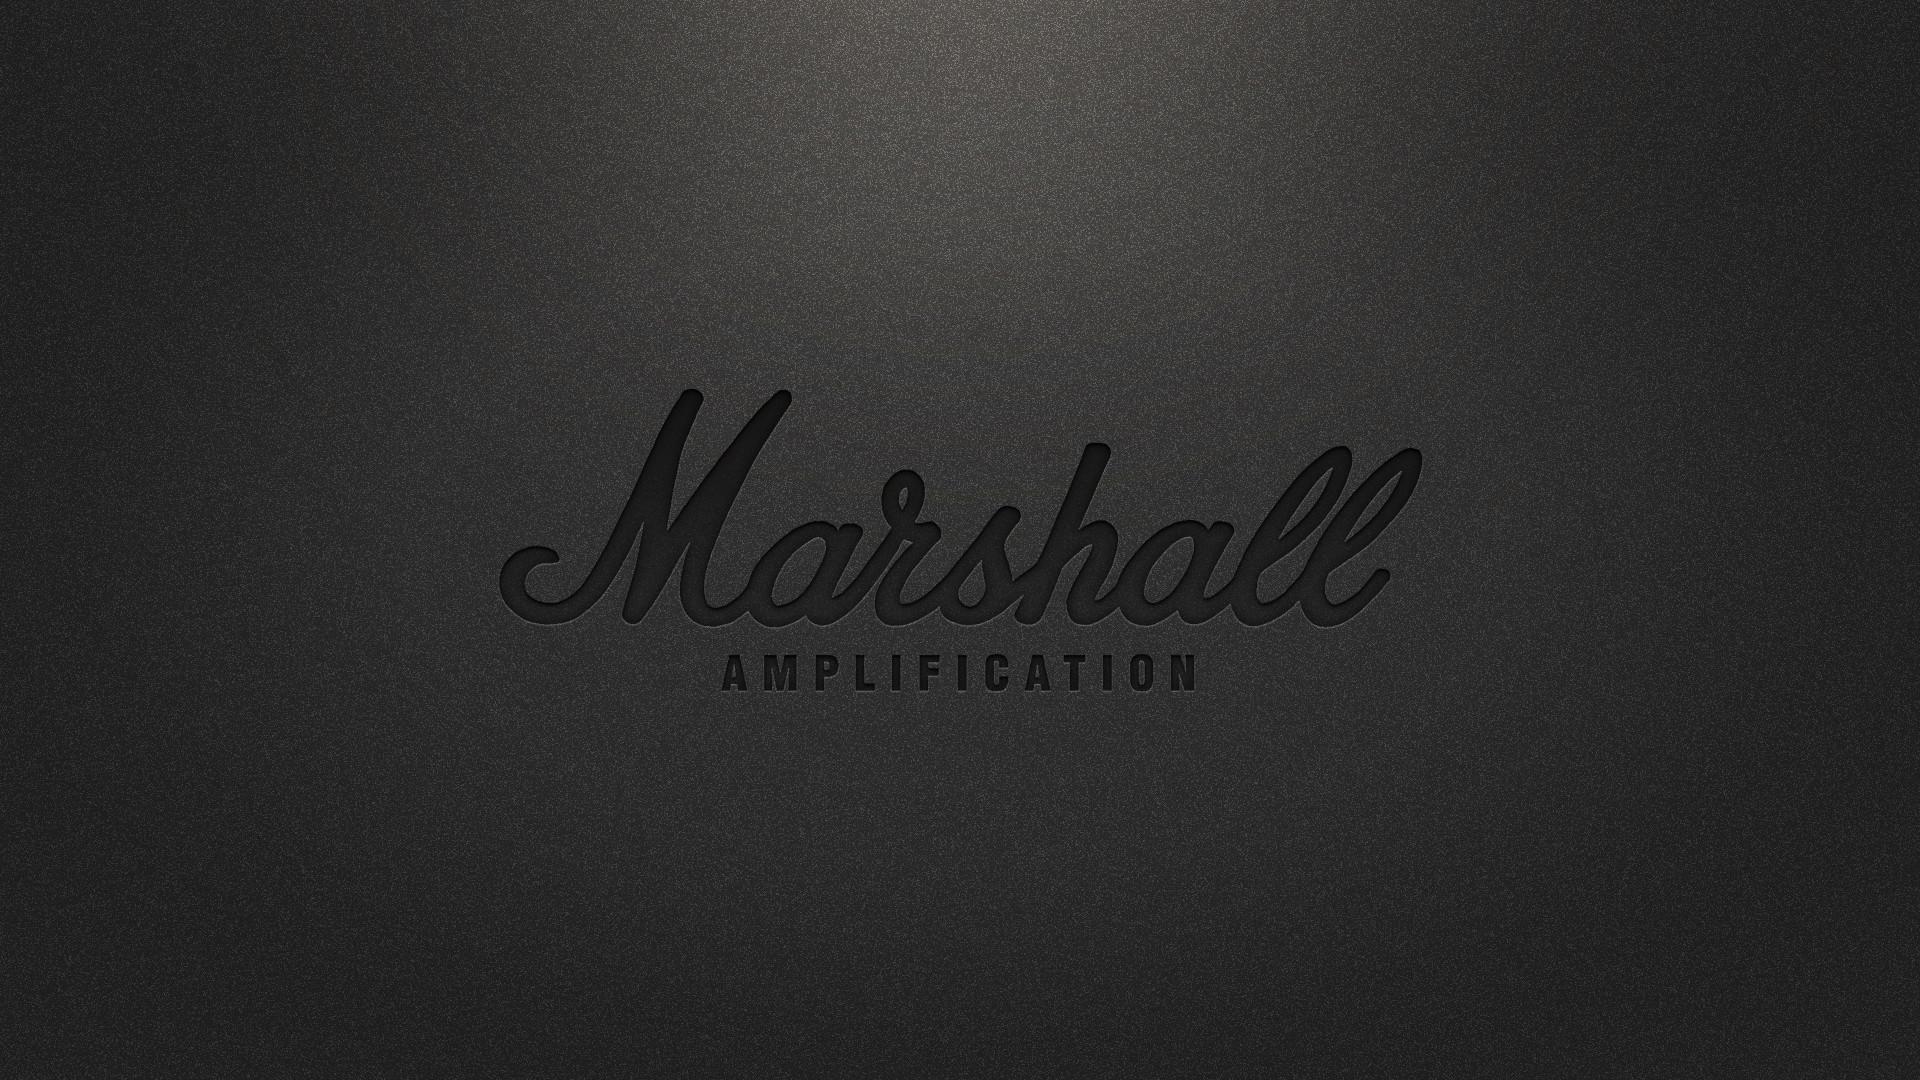 Marshall Amp Wallpaper – WallpaperSafari